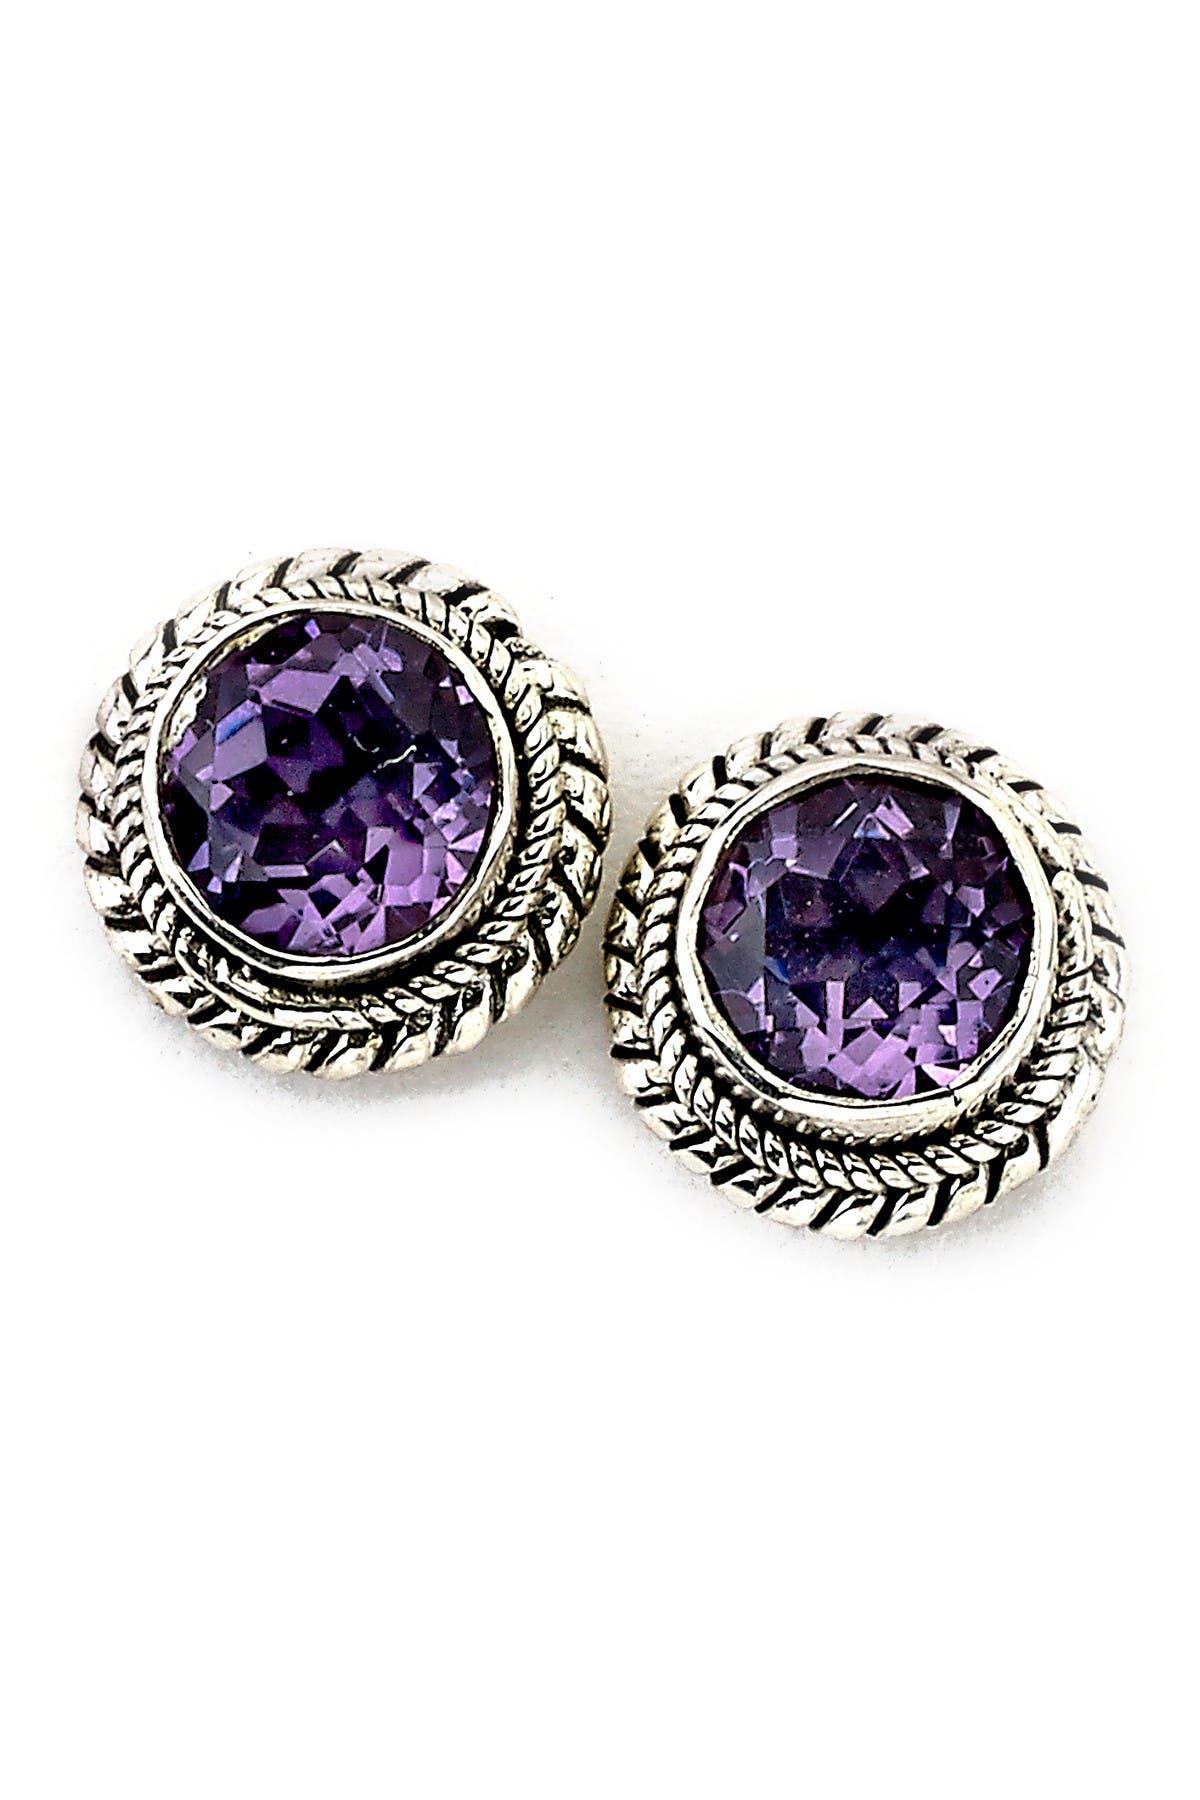 Image of Samuel B Jewelry Sterling Silver Round Amethyst Stud Earrings